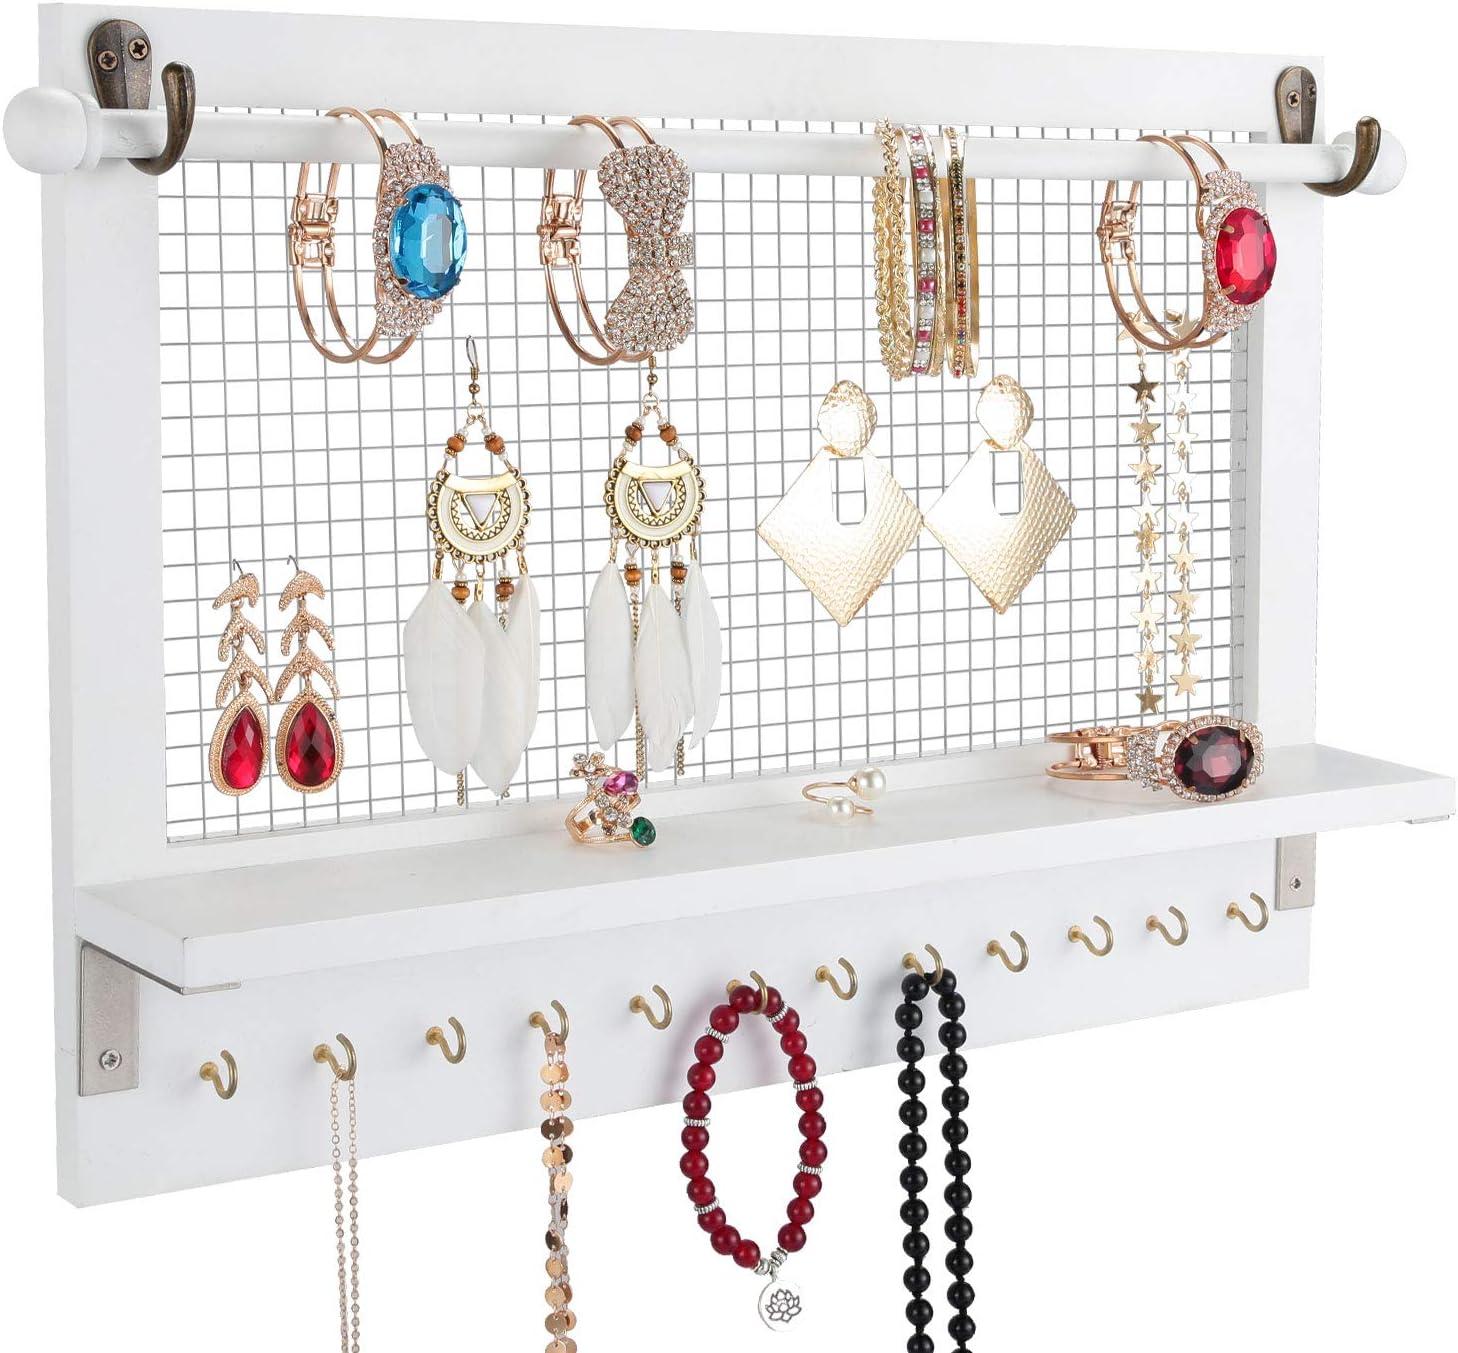 Halvalo Wall Jewelry Organizer Wood Jewelry Holder Large Storage Bracelets Necklaces Earrings Organizer Holders Jewelry Display Shelf with Hooks